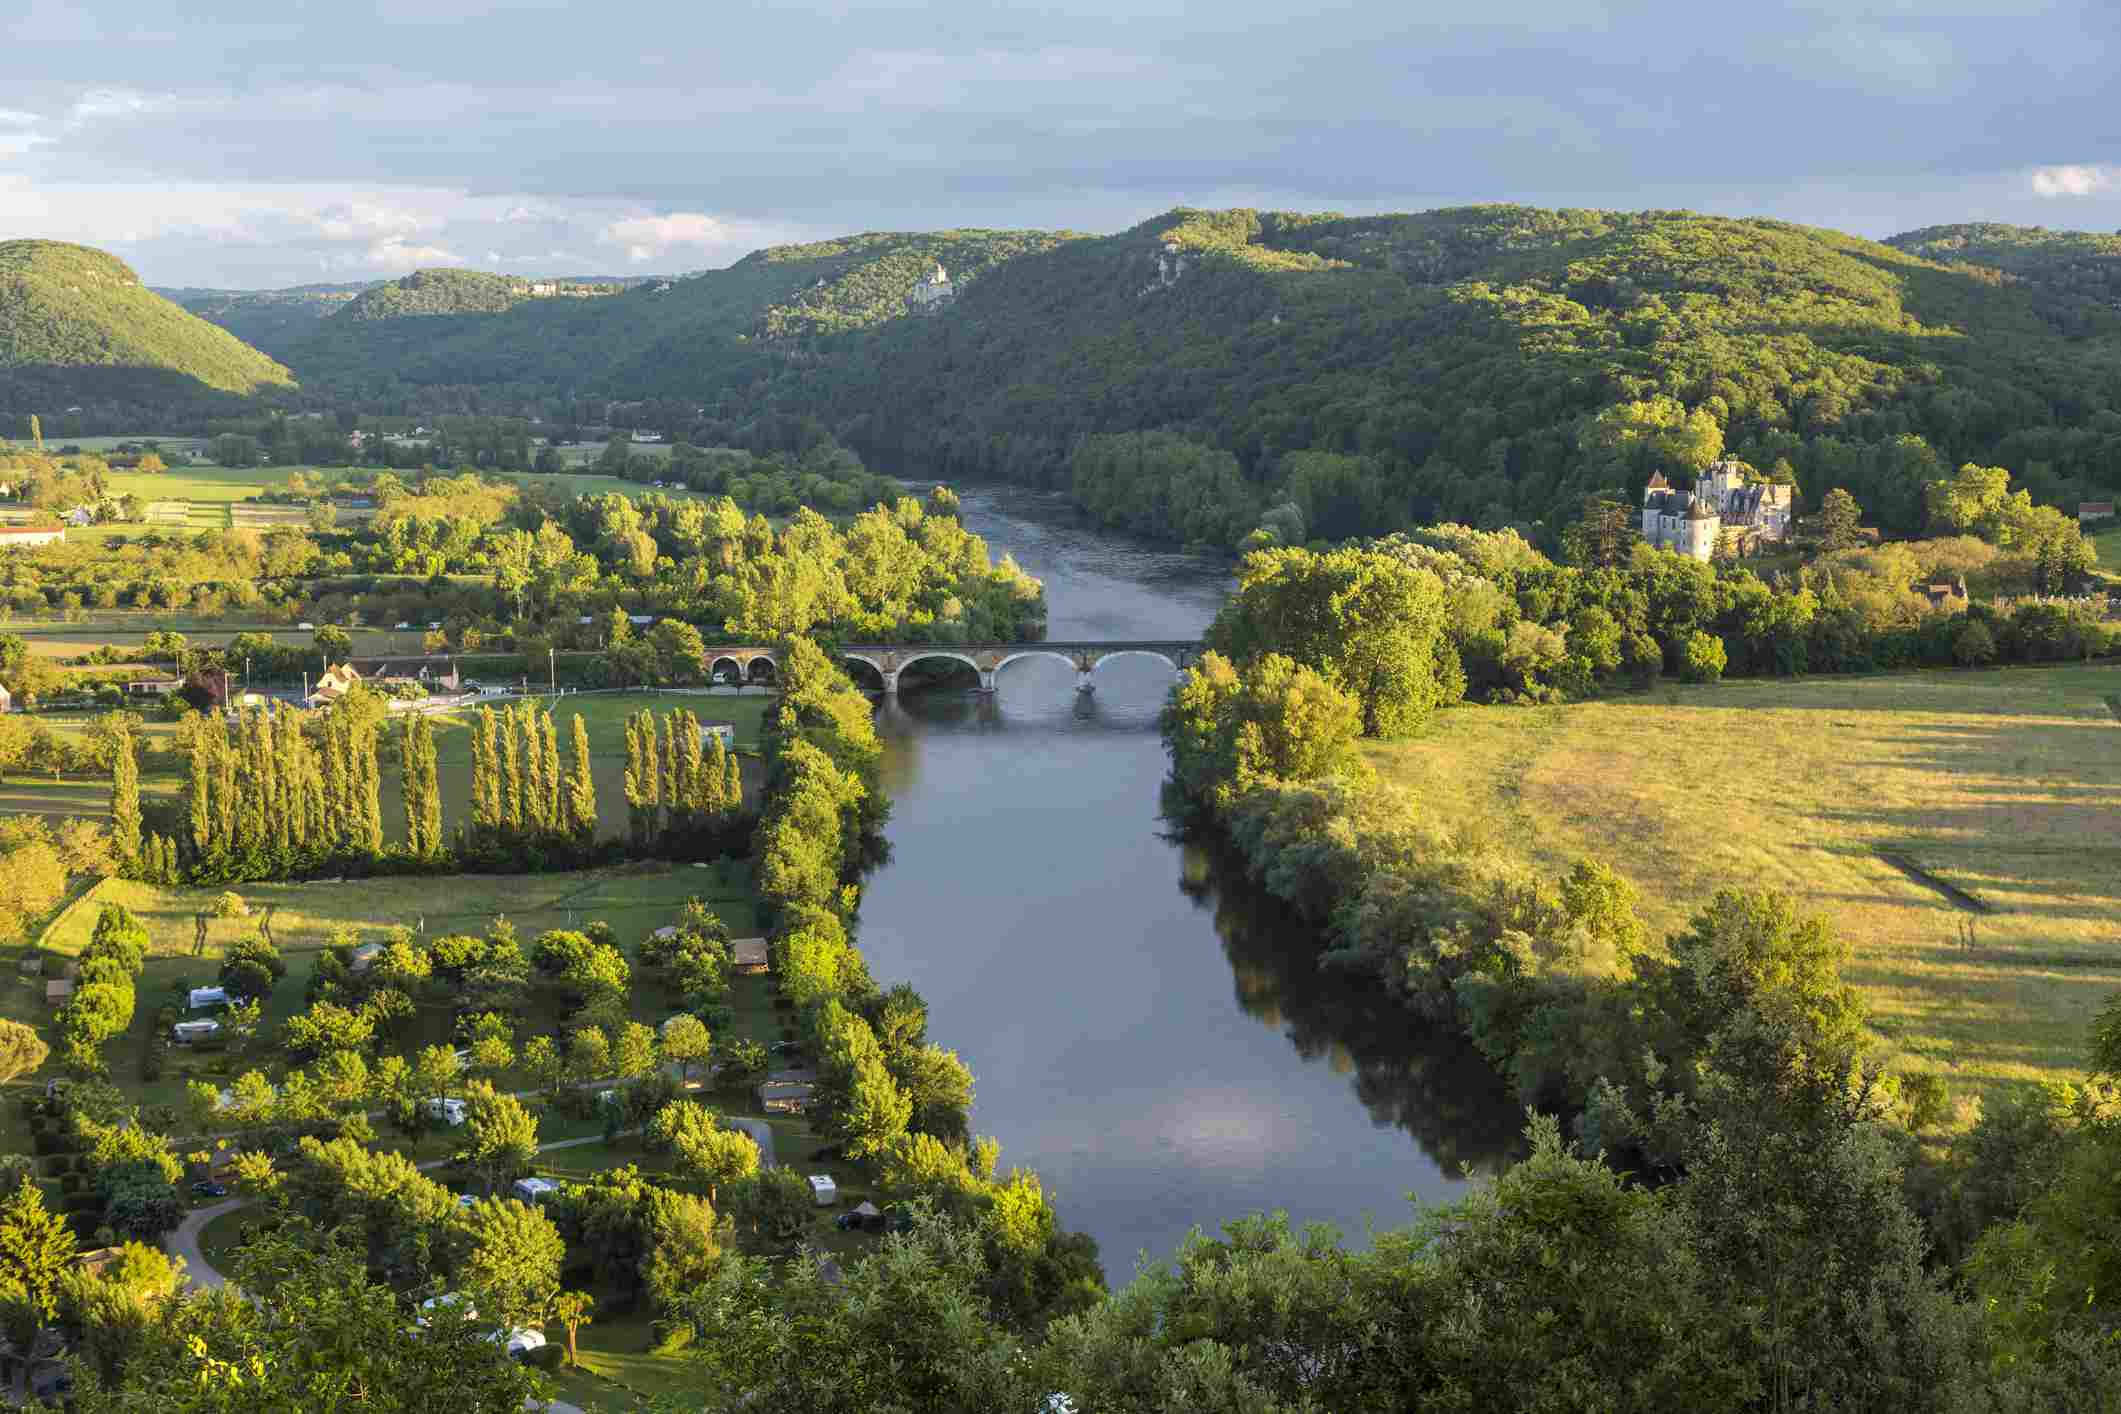 France, Dordogne, Beynac, Beynac-et-Cazenac, View over Dordogne River